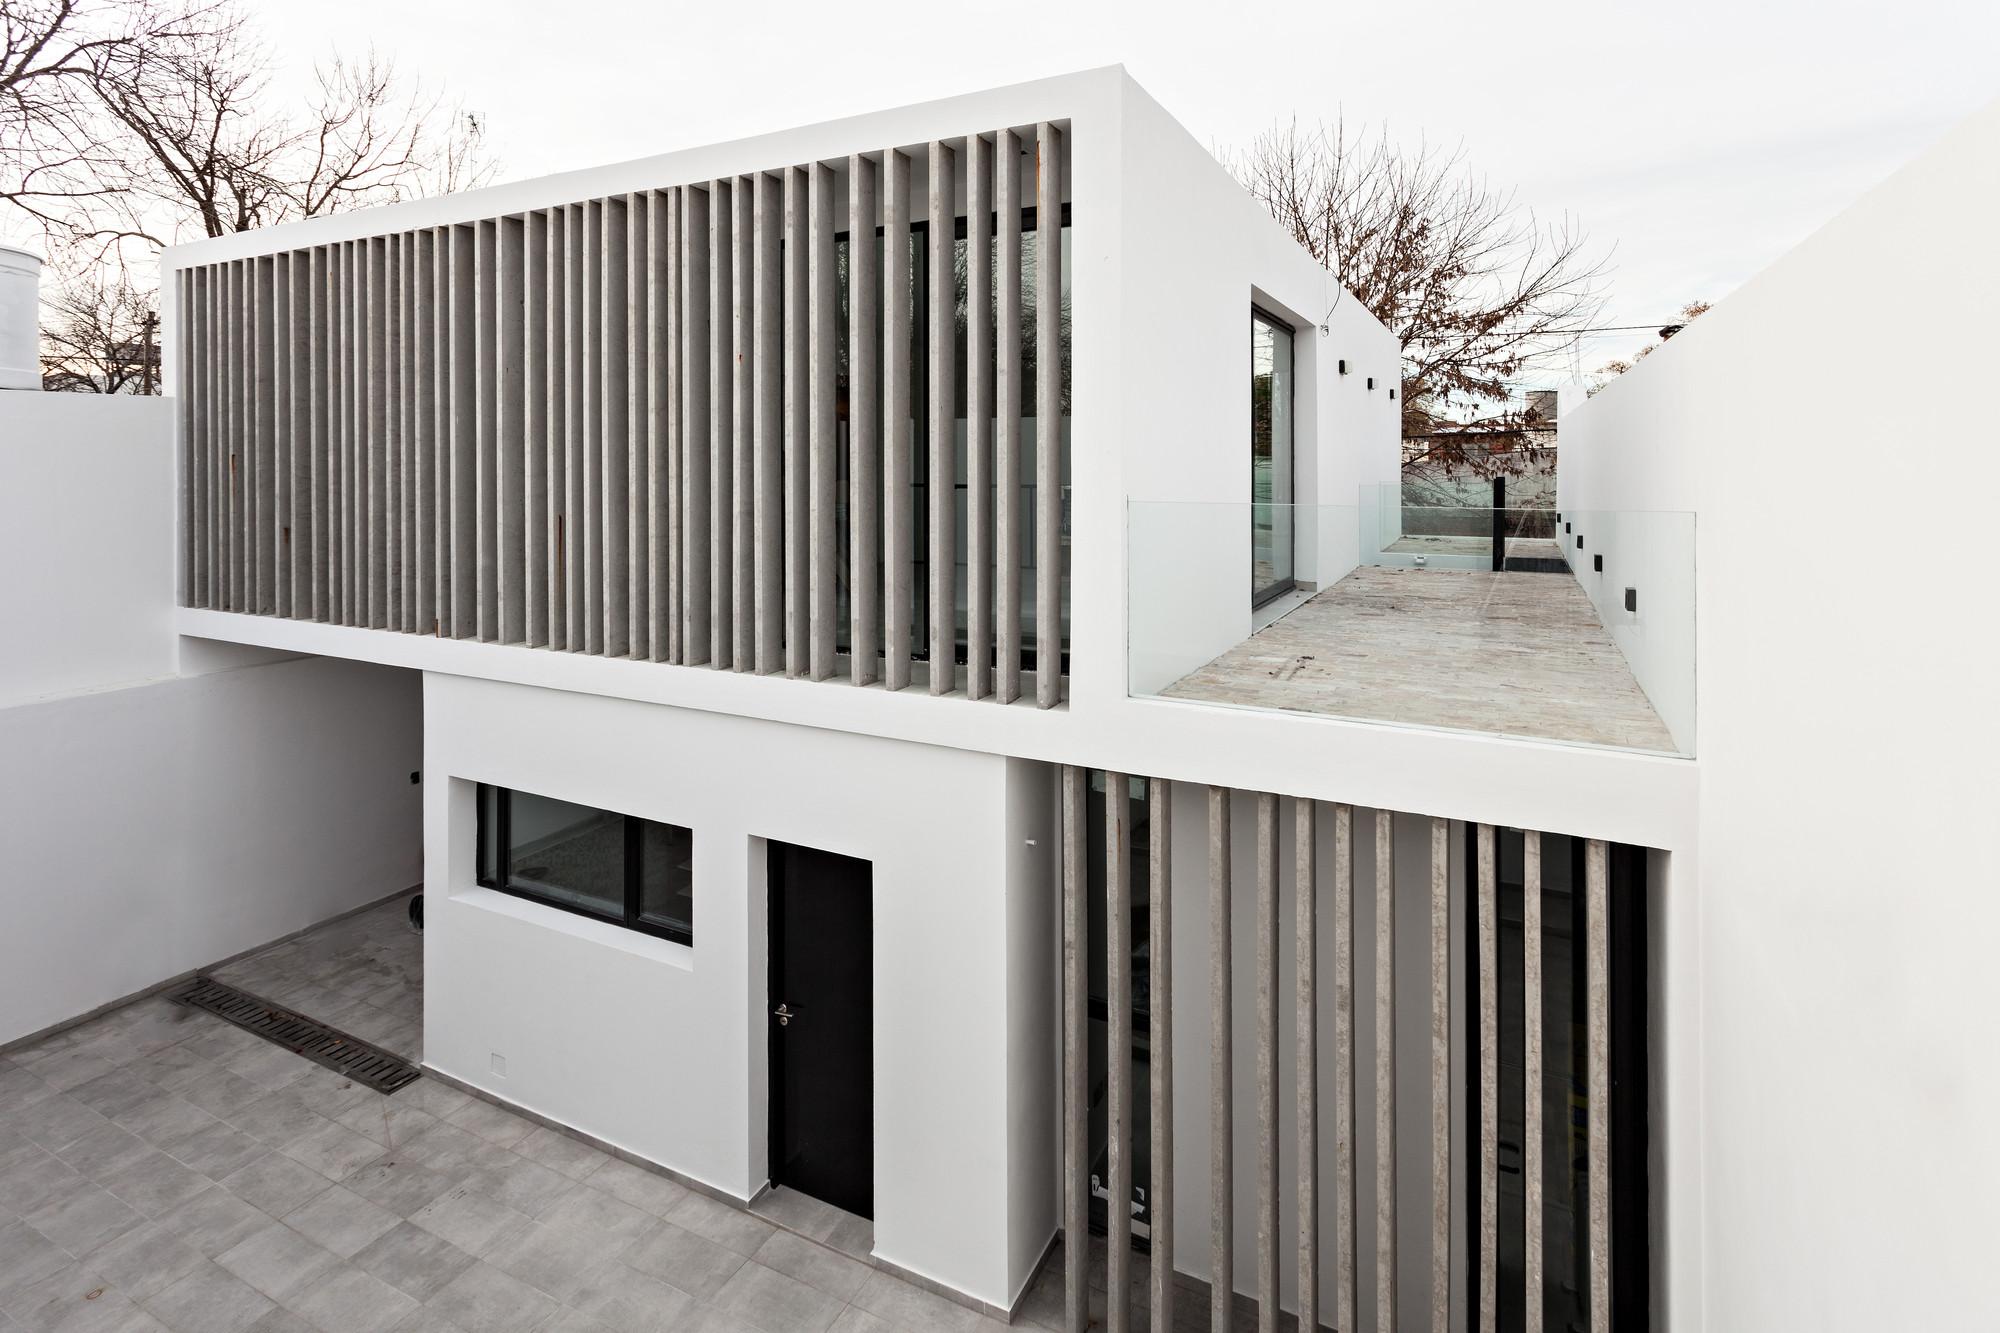 Casa bazan smf arquitectos plataforma arquitectura for Plataforma de arquitectura